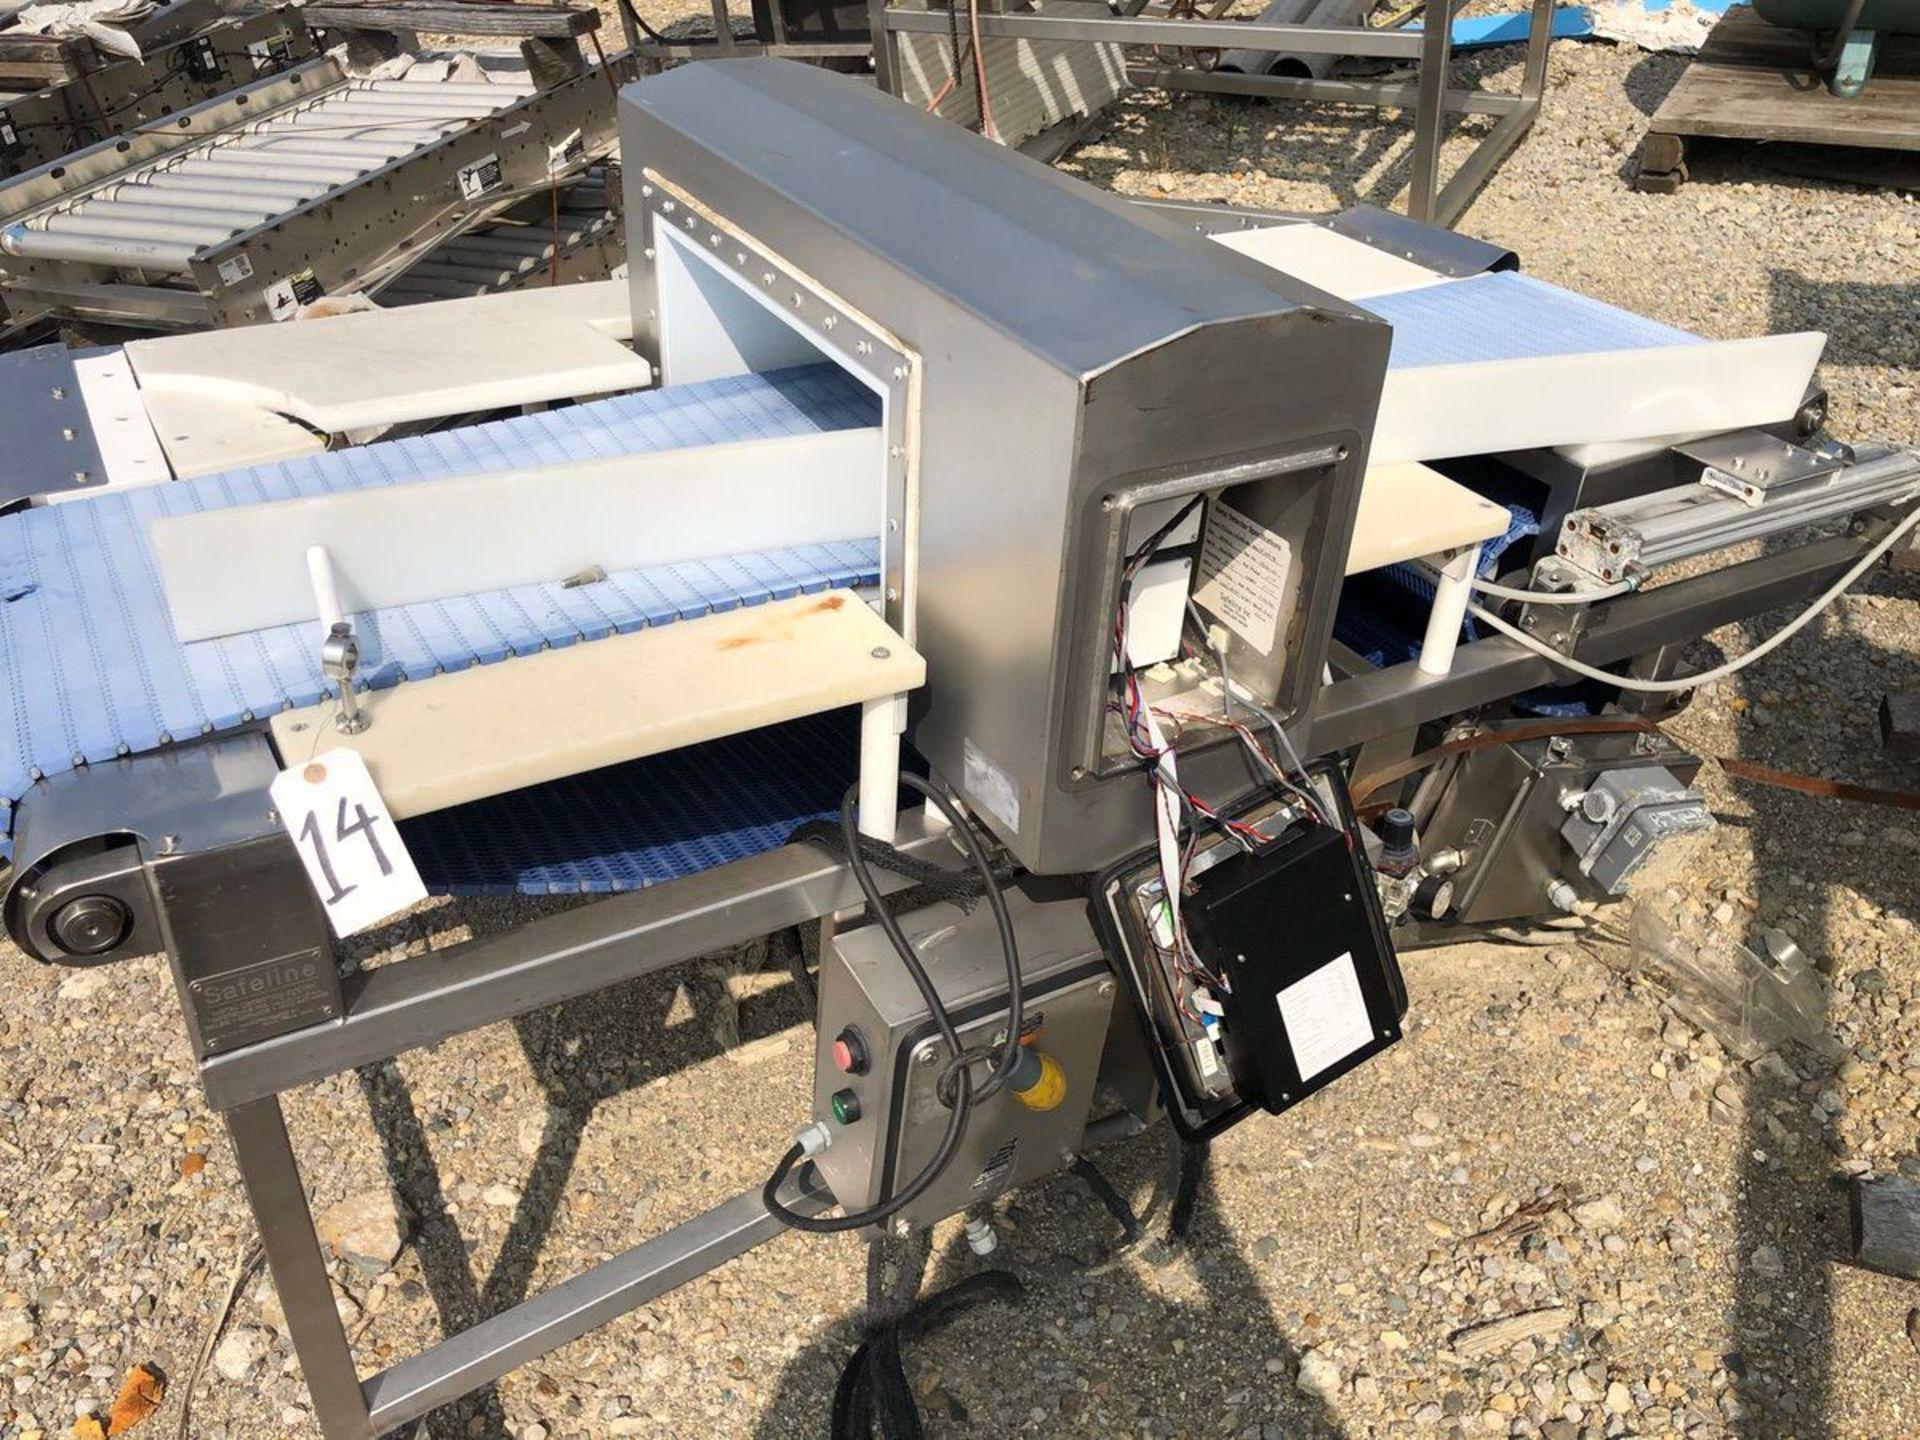 Safeline Metal Detector, Approx Aperture 20in W x 7in Clear | Rig Fee: $150 See Full Desc